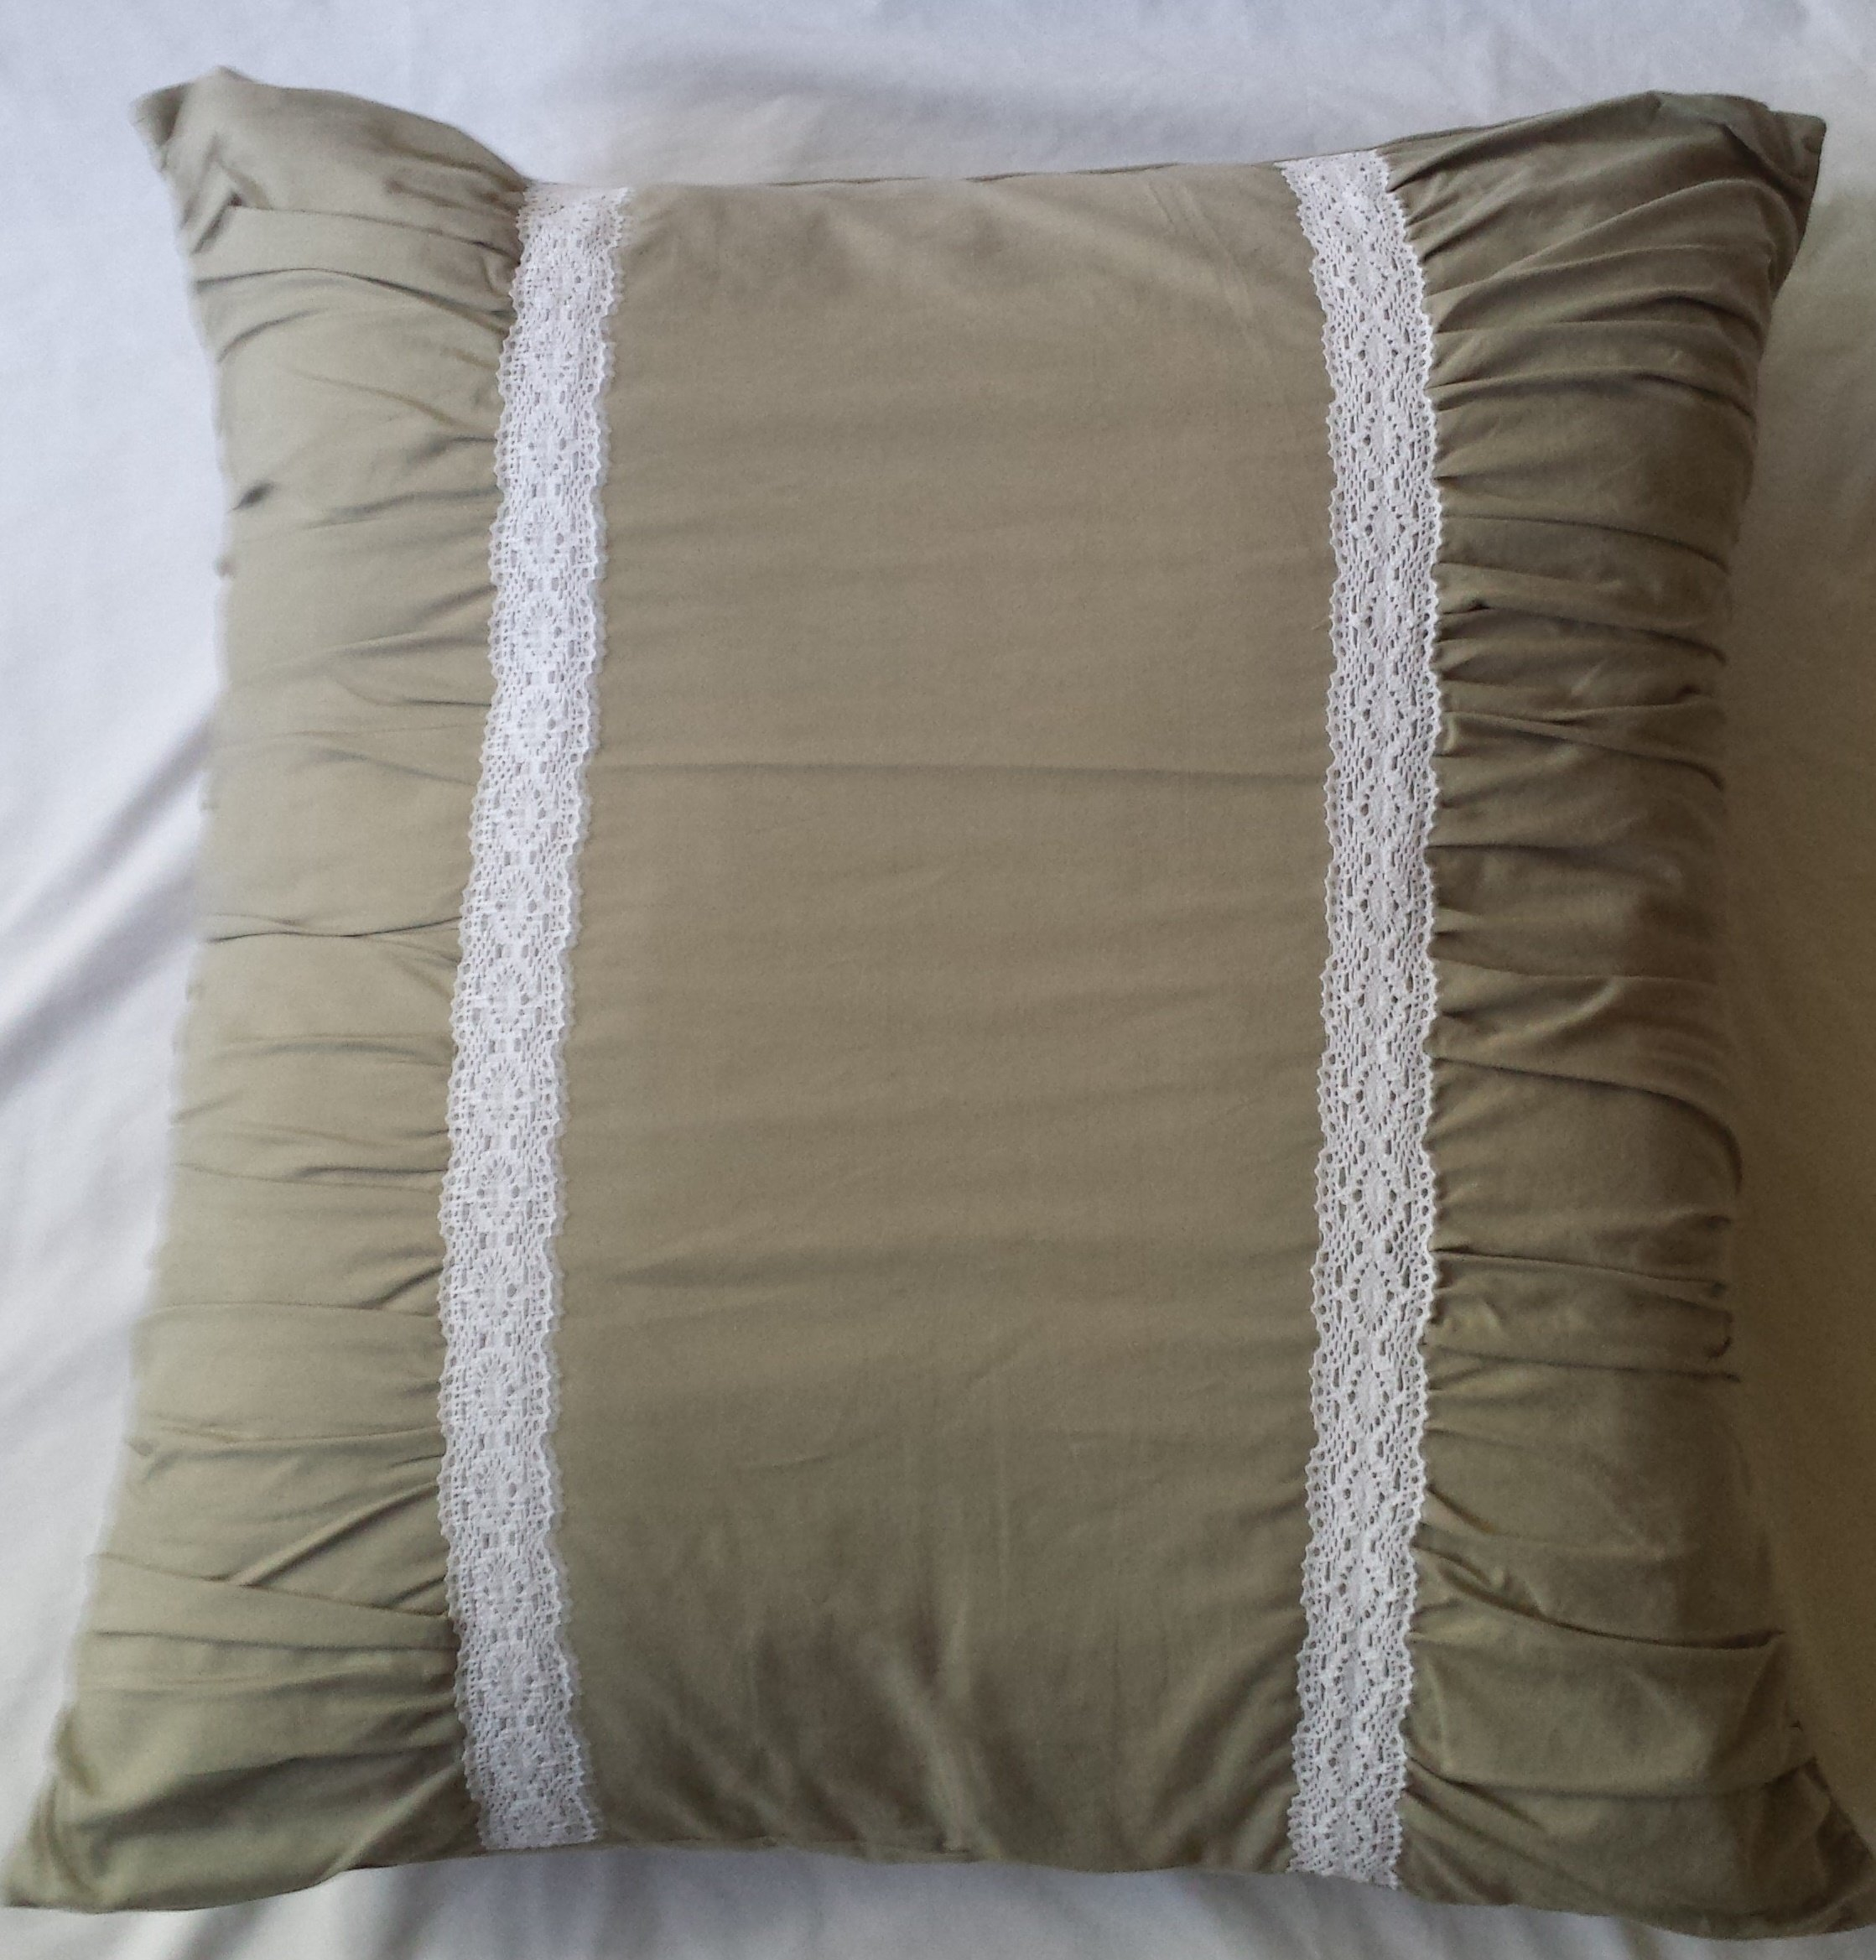 Square Pillow Sham Fits 26'' x 26'' Euro Pillow Driftwood Gray: Soft Cotton Design. 1 sham.